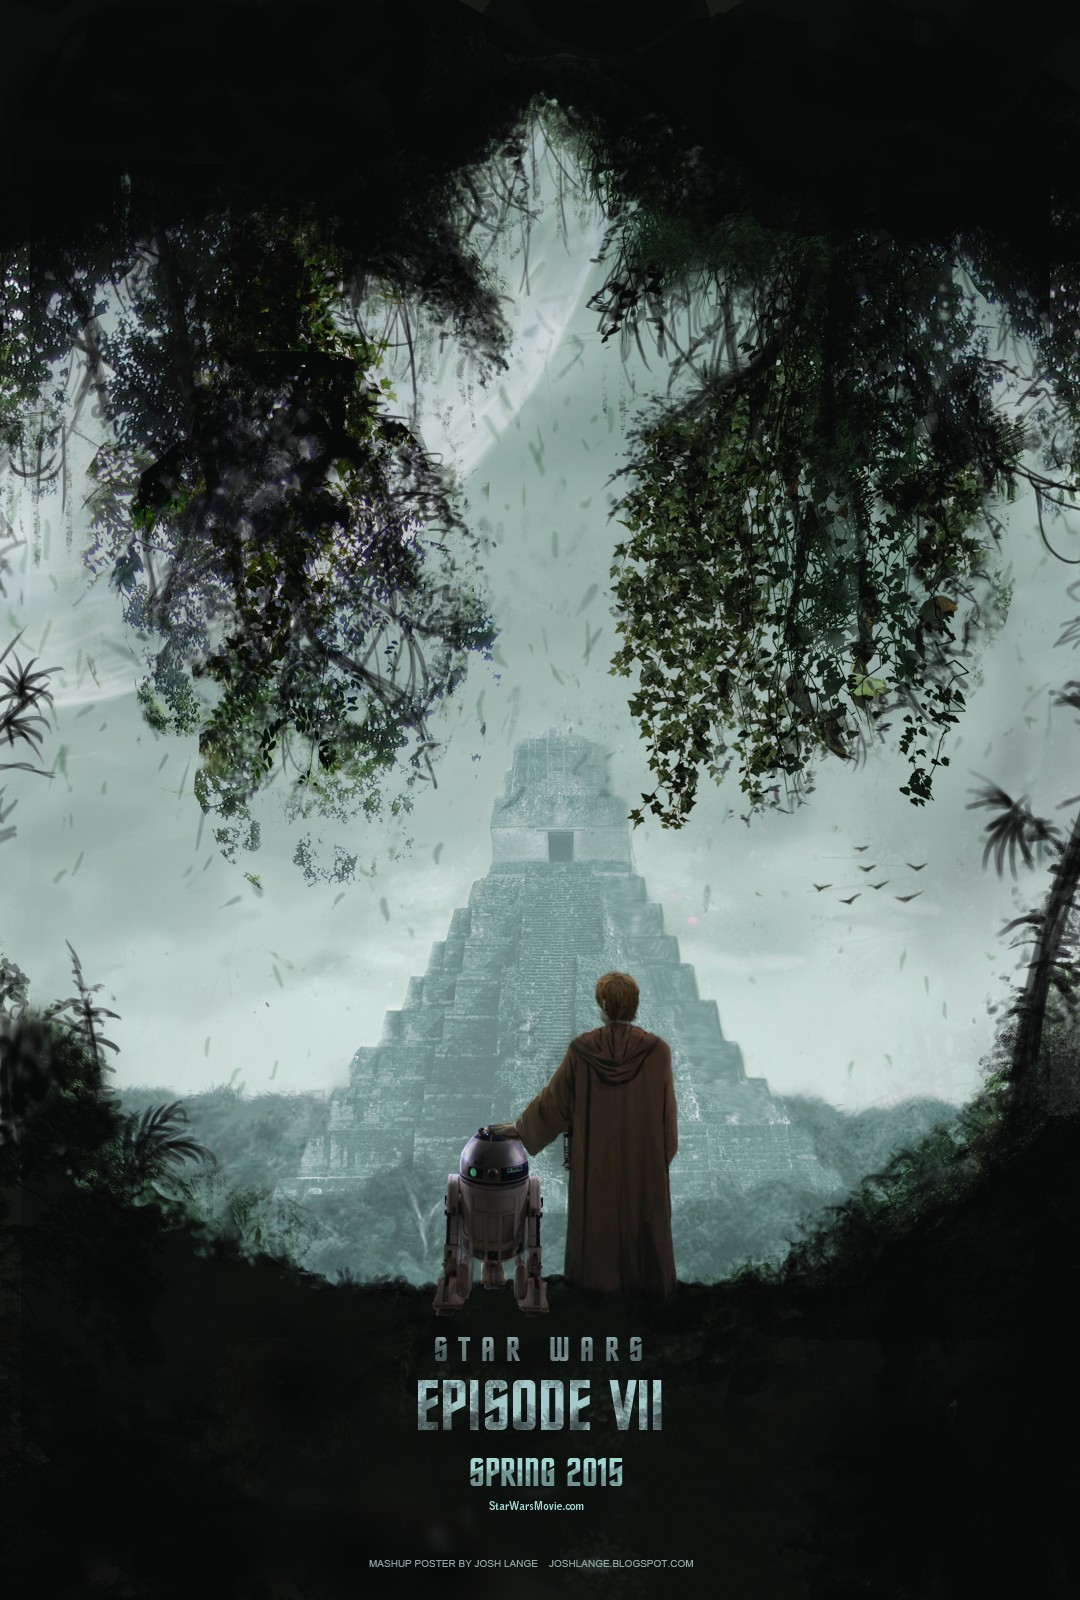 Star Wars Episode 7 Wallpapers HD Download 1080x1600